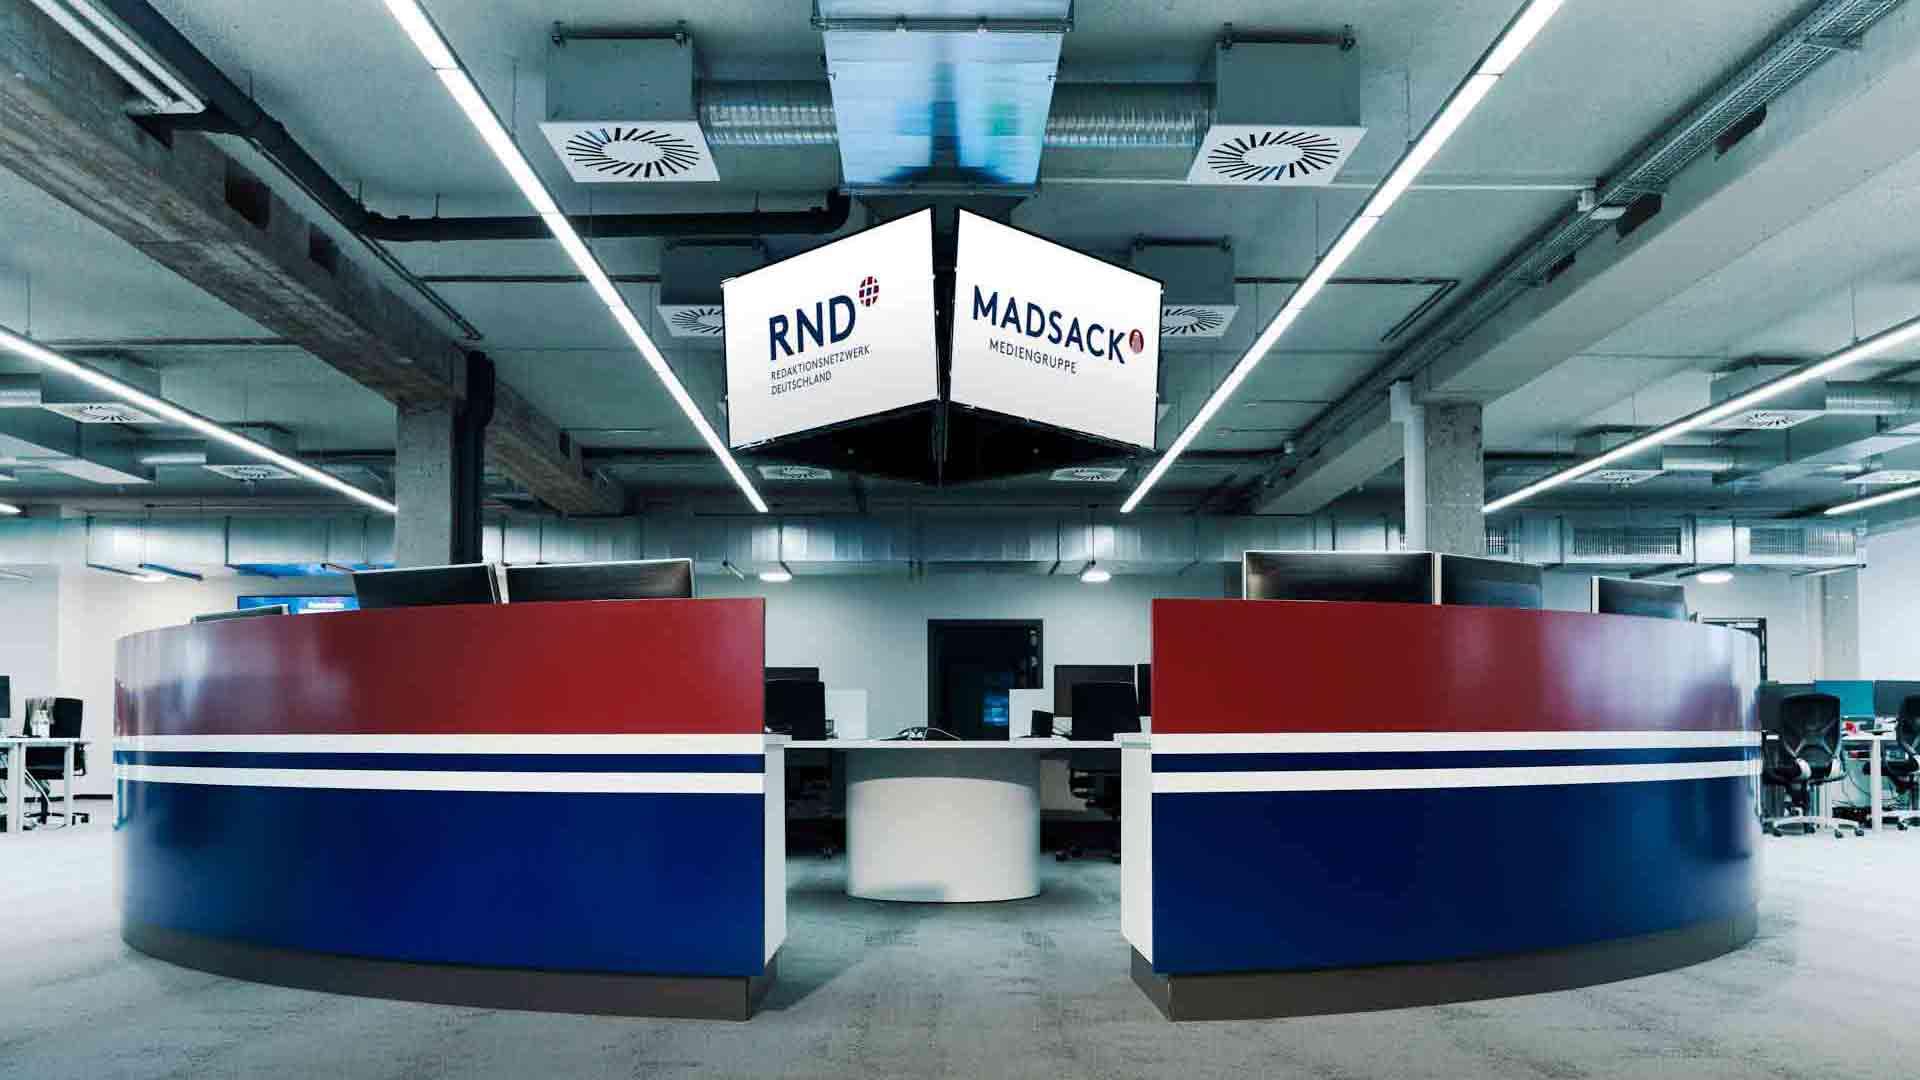 Bild der RND Newsroom